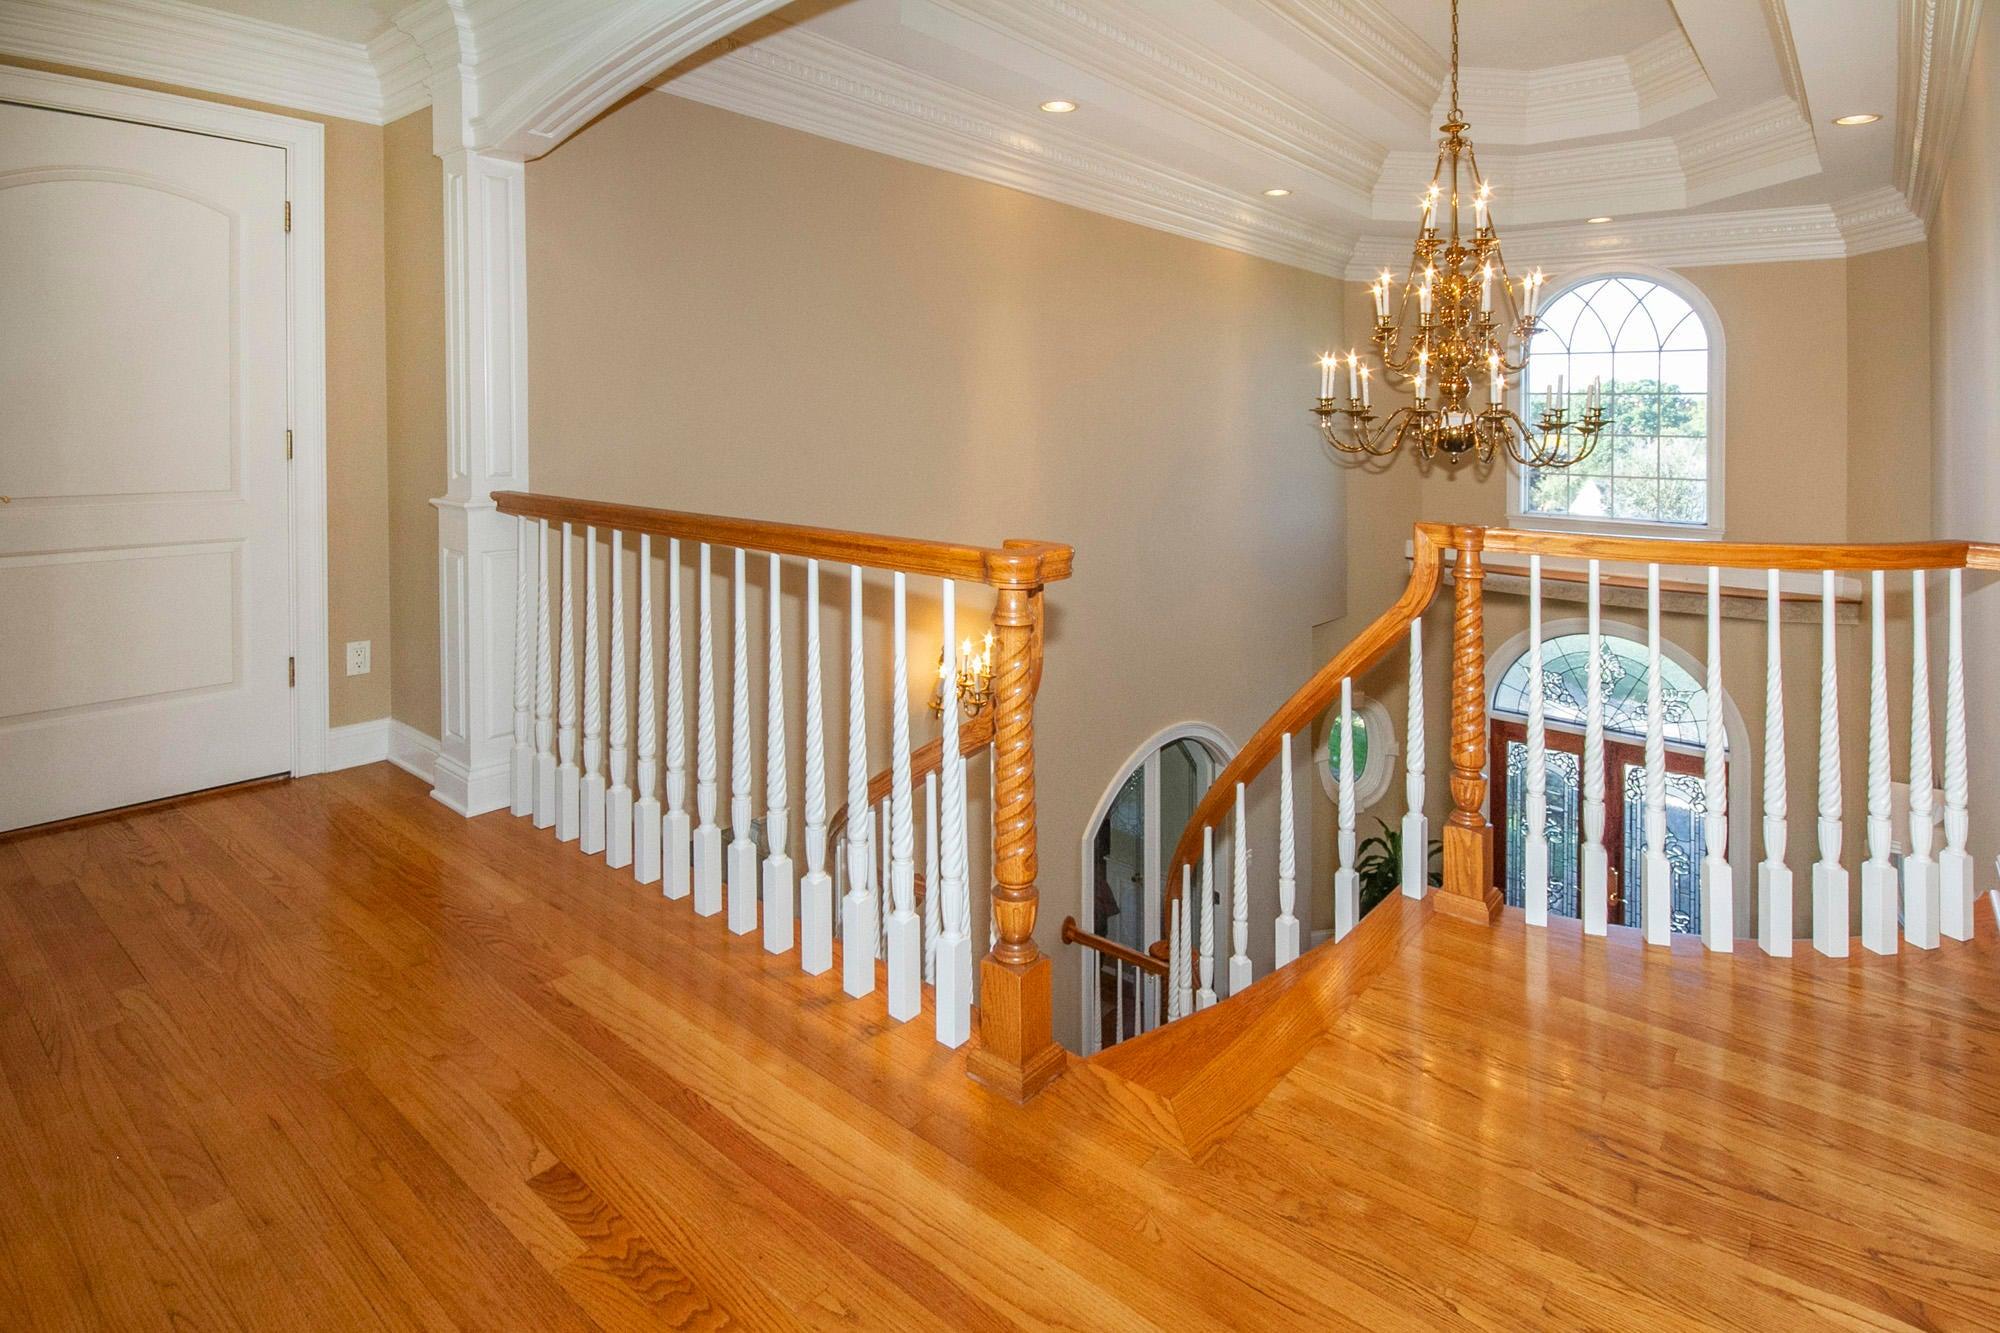 Foyer double trey ceiling